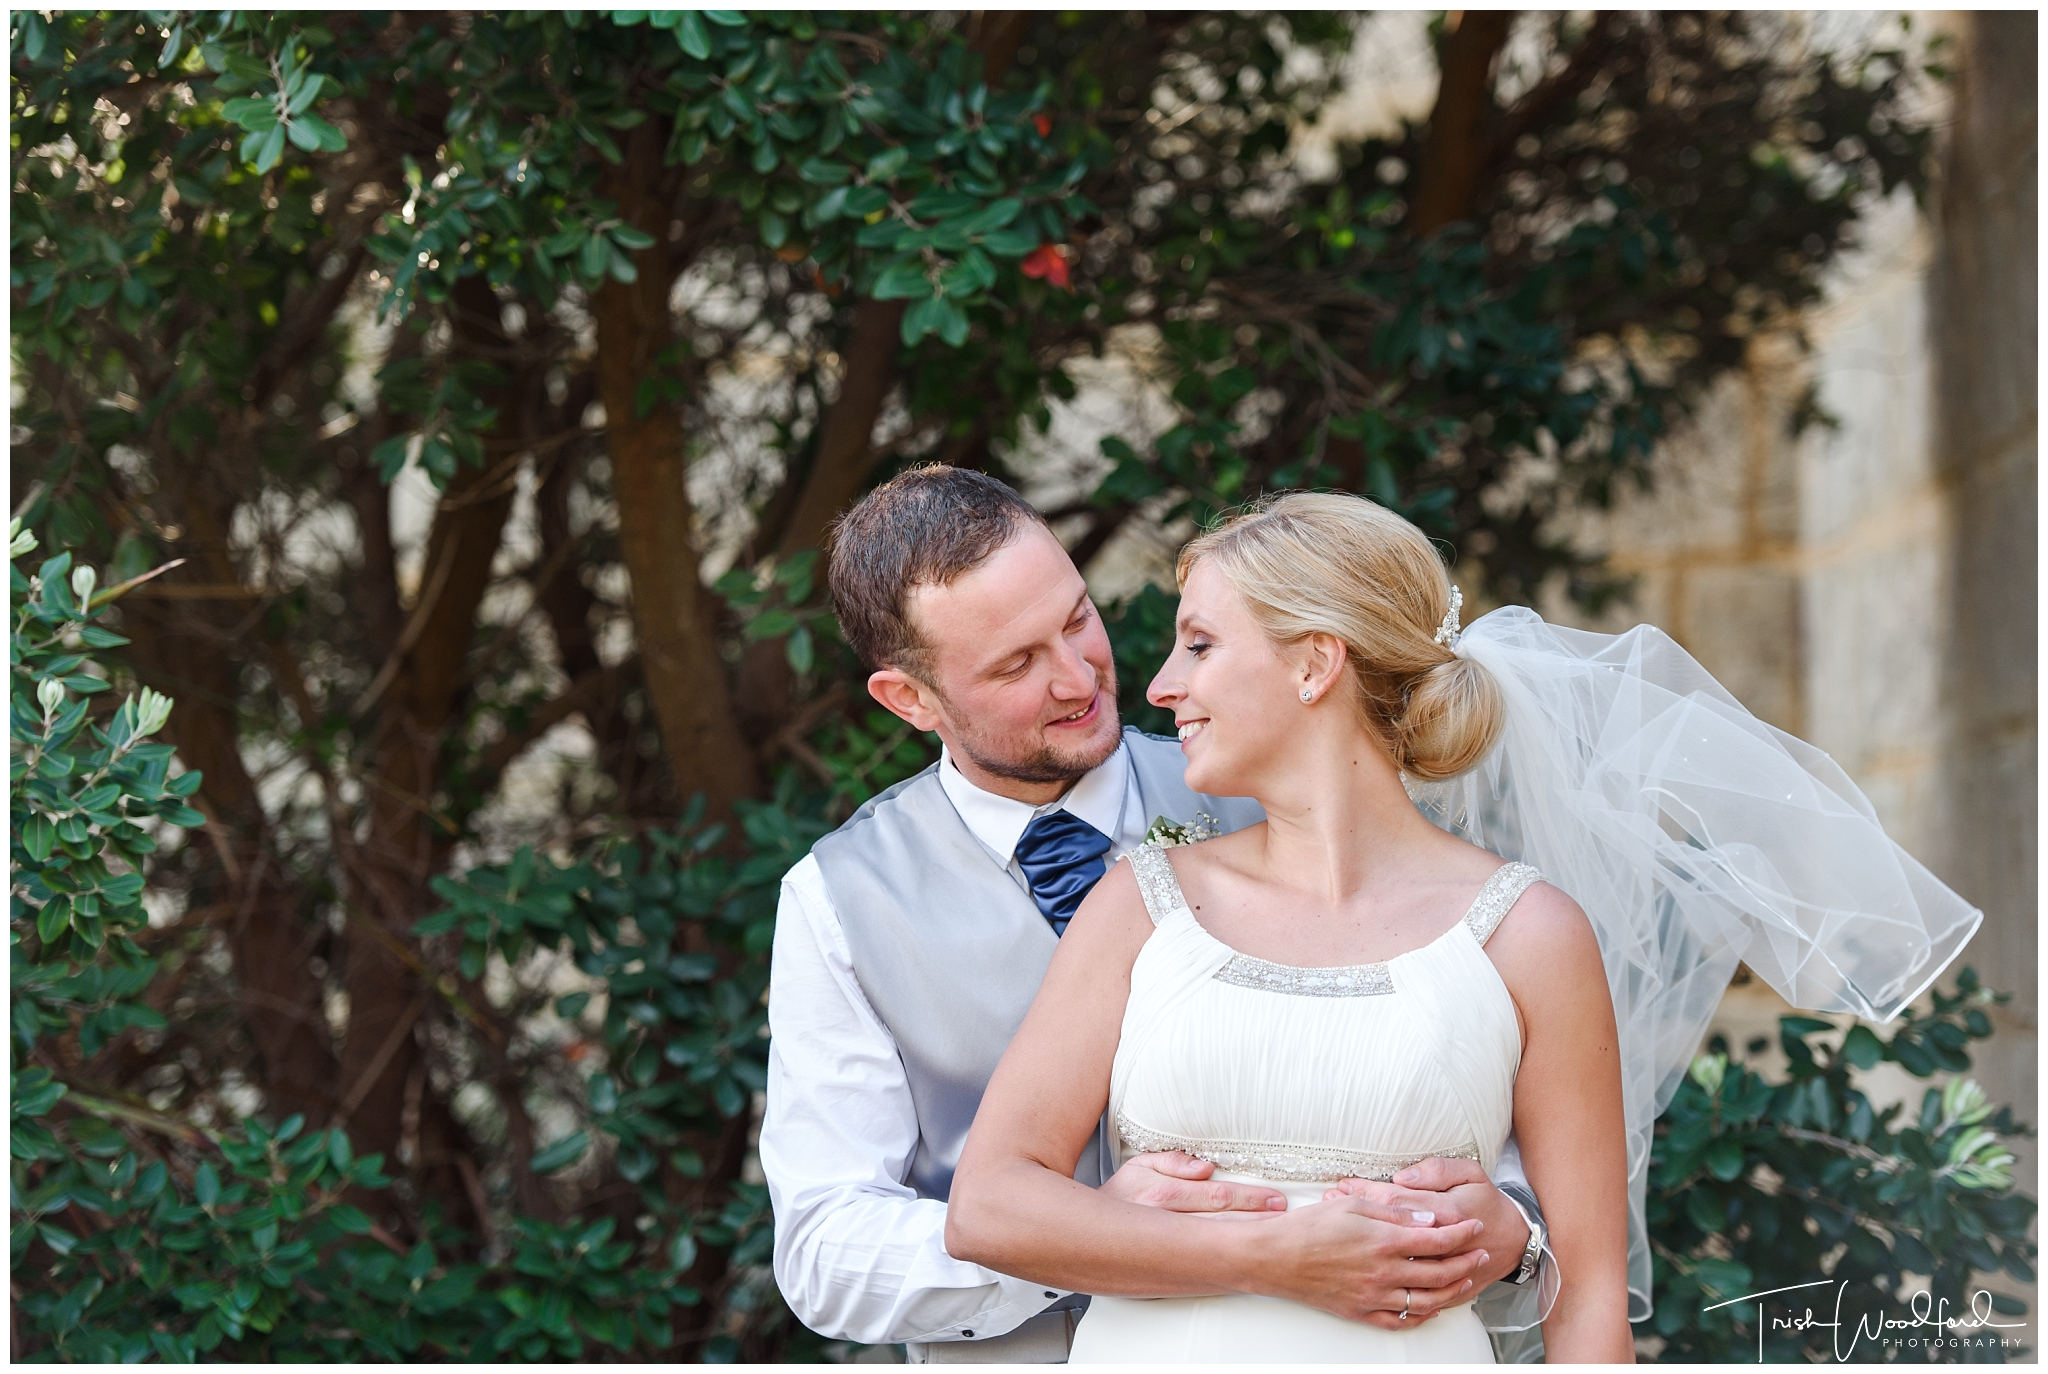 Perth Wedding Photography Bride & Groom